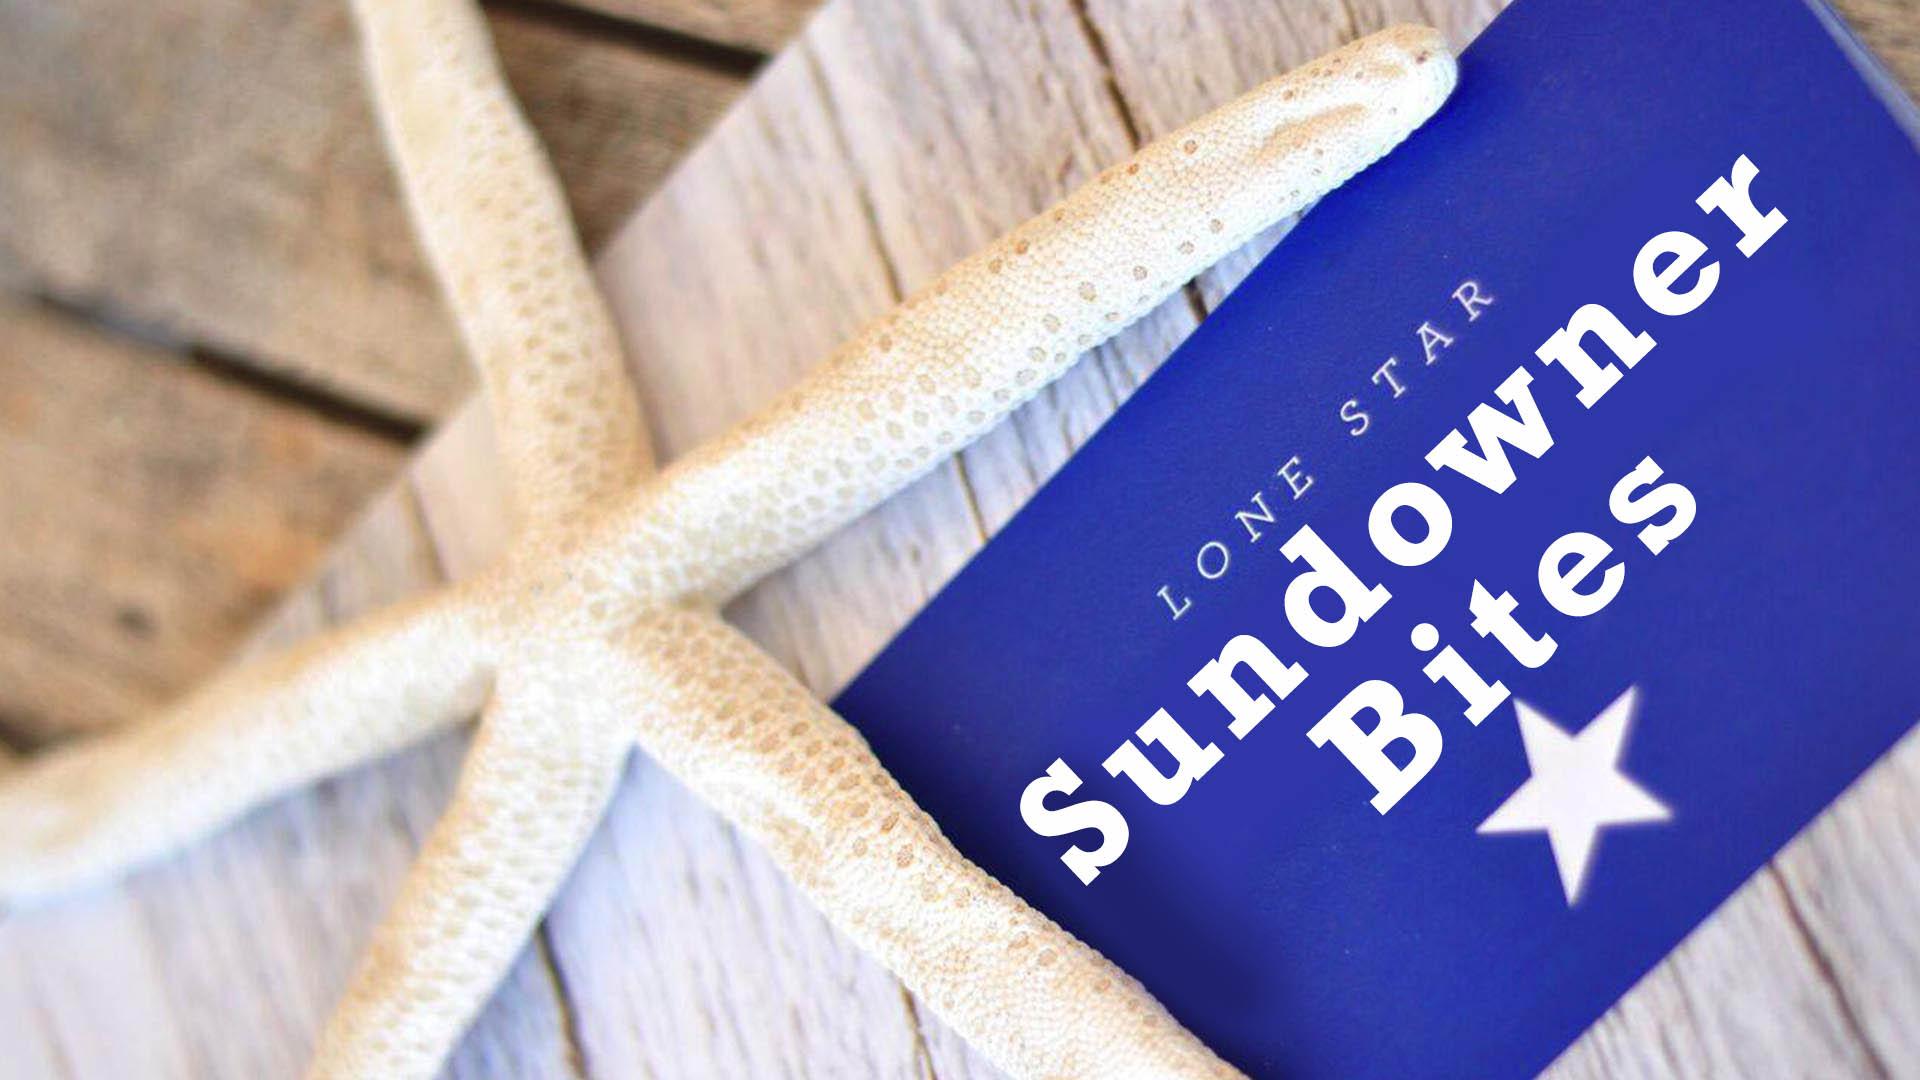 Sundowner Bites Menu at the Lone Star Restaurant Barbados